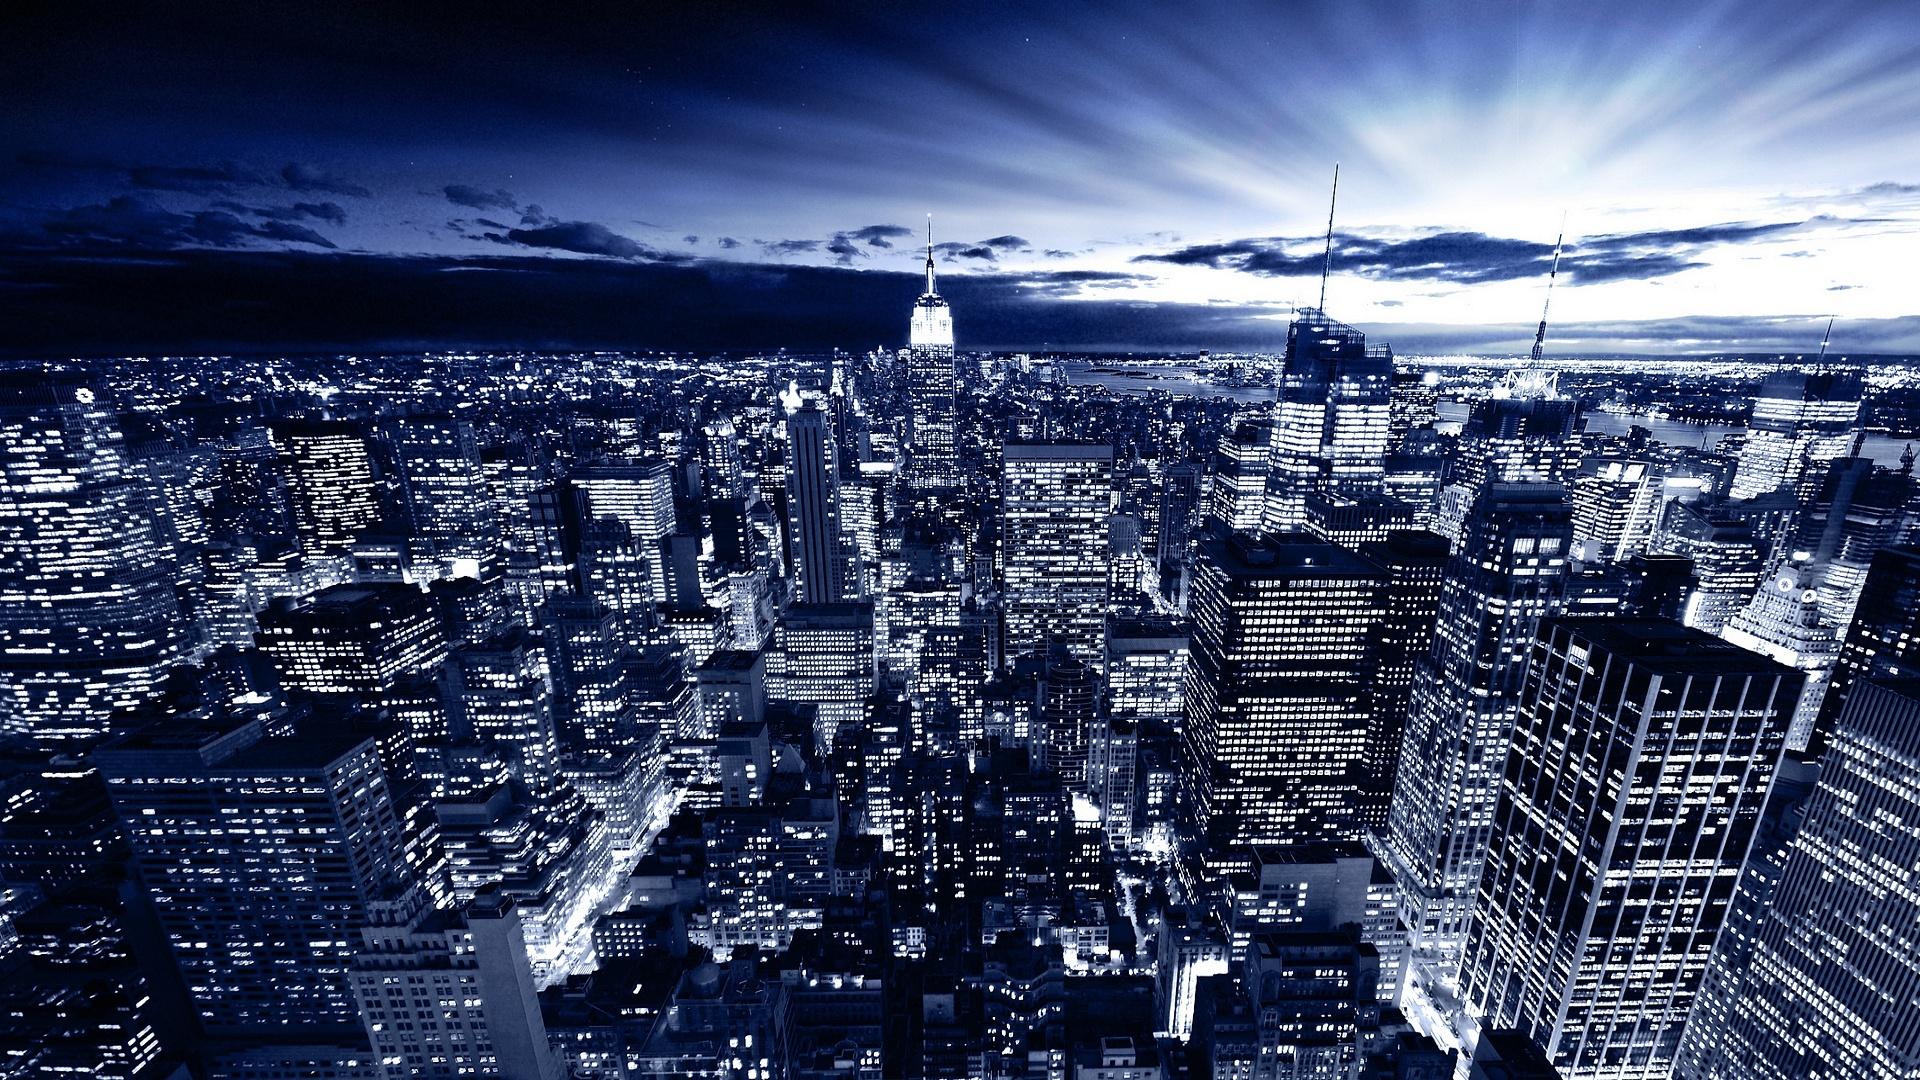 new york in blue cityscape wallpaper Desktop Backgrounds for HD 1920x1080